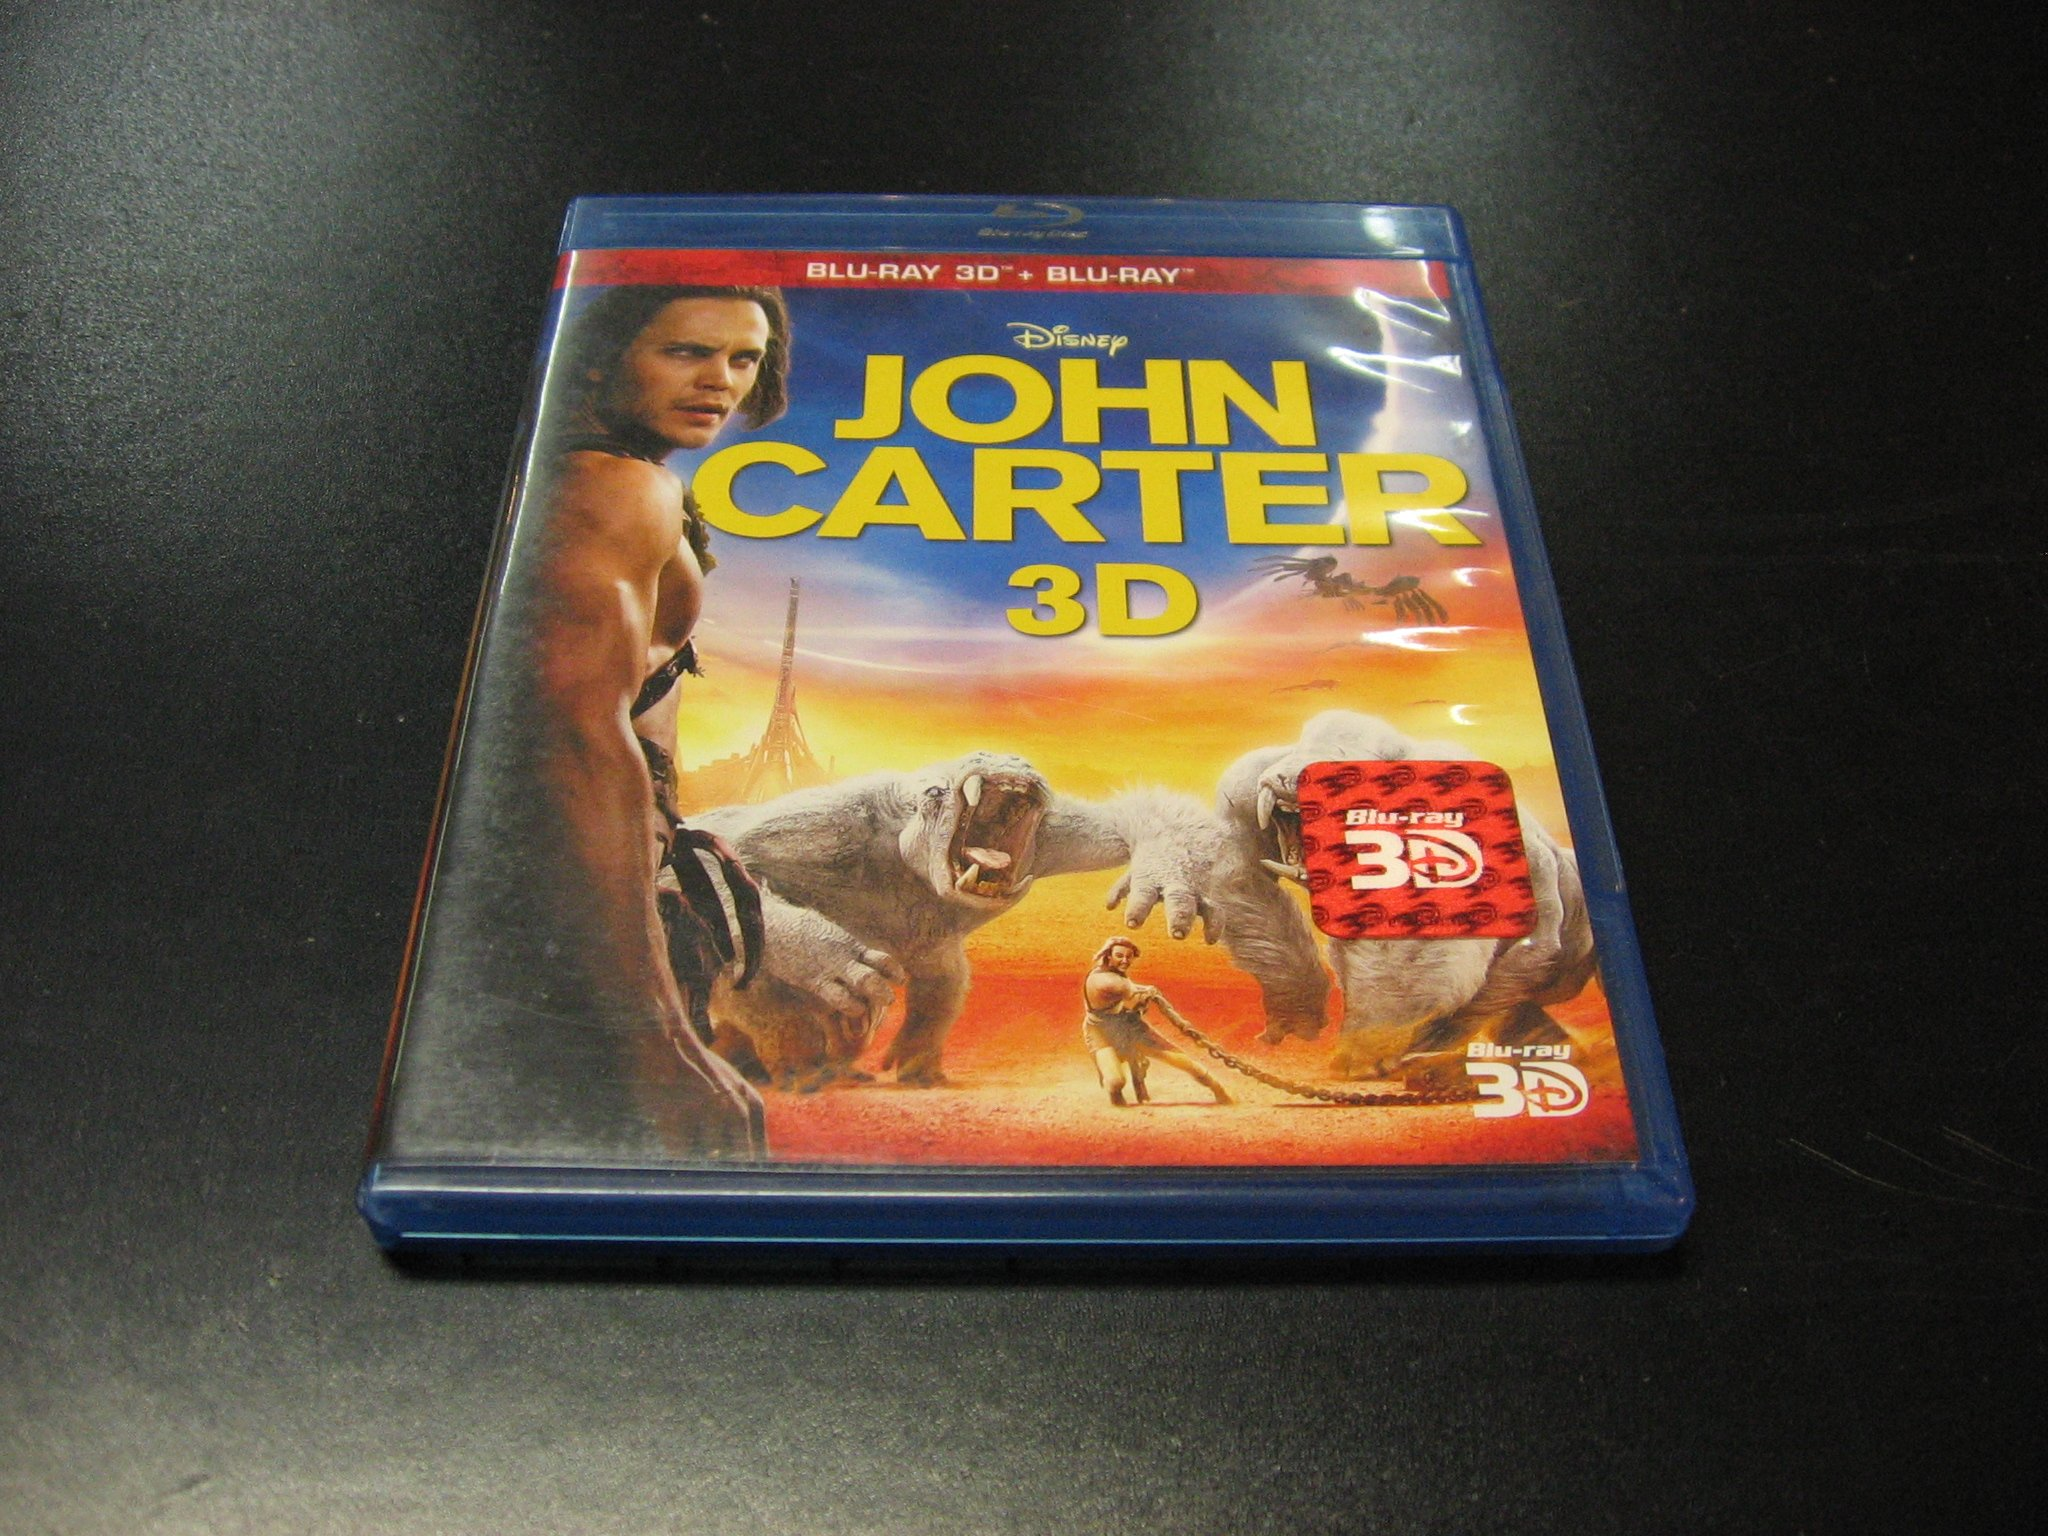 JOHN CARTER - Płyty Blu-ray 3D - Opole